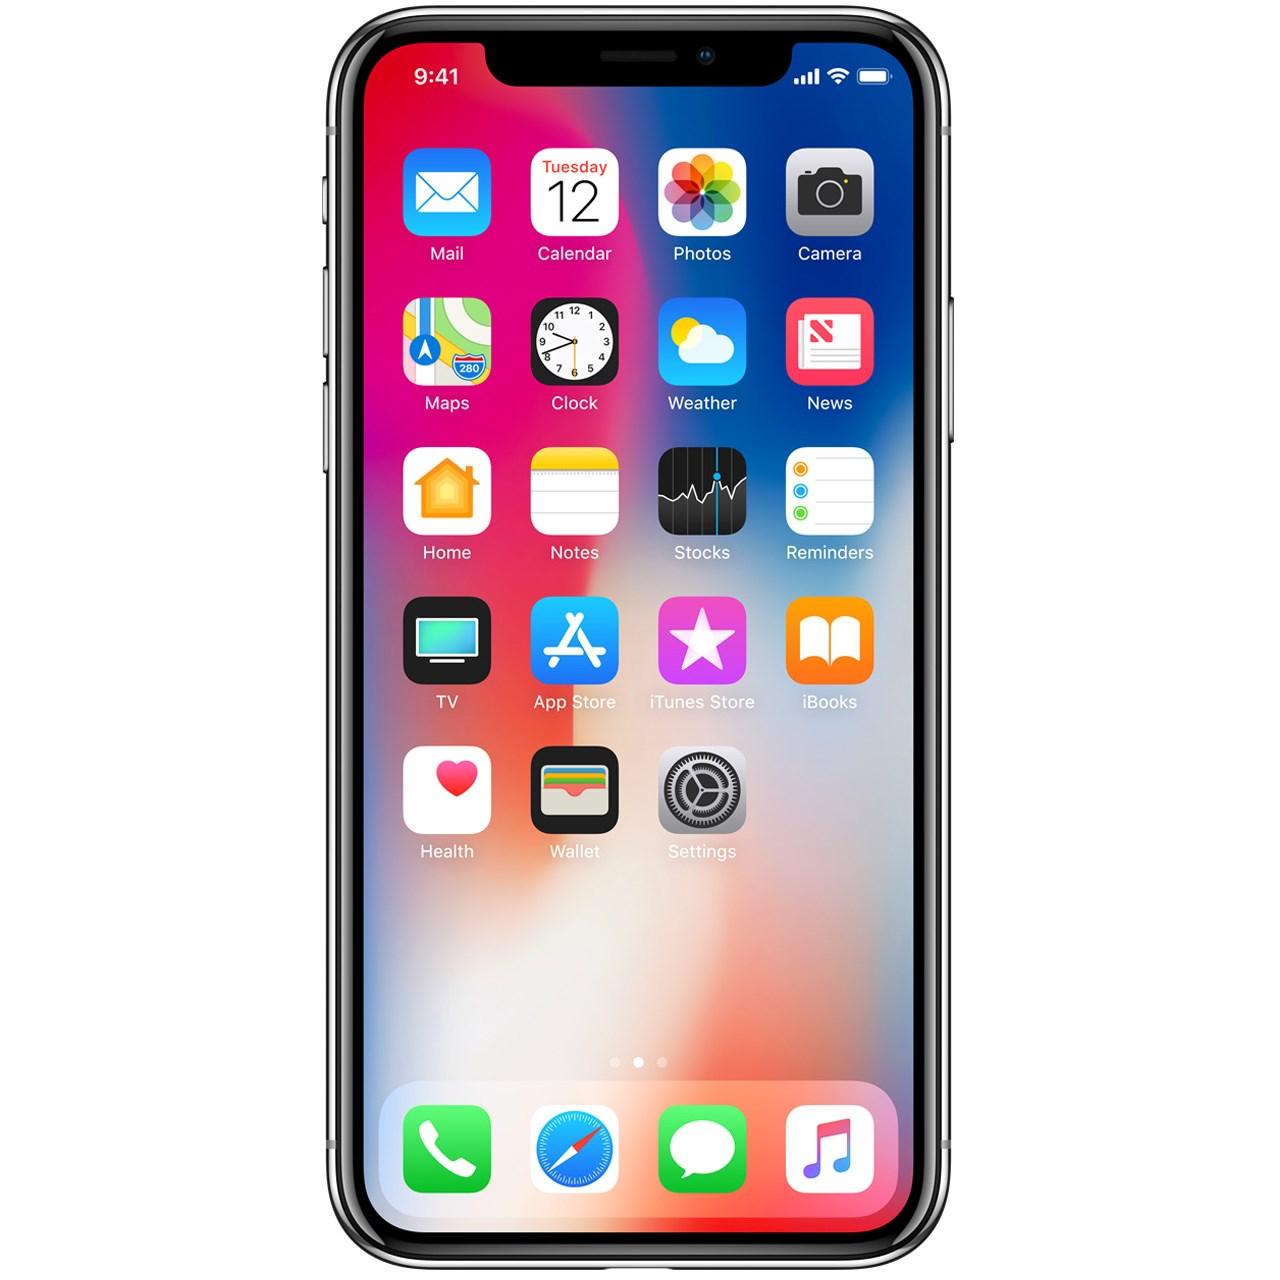 فروش اقساطي گوشي موبايل اپل مدل iPhone X ظرفيت 256 گيگابايت